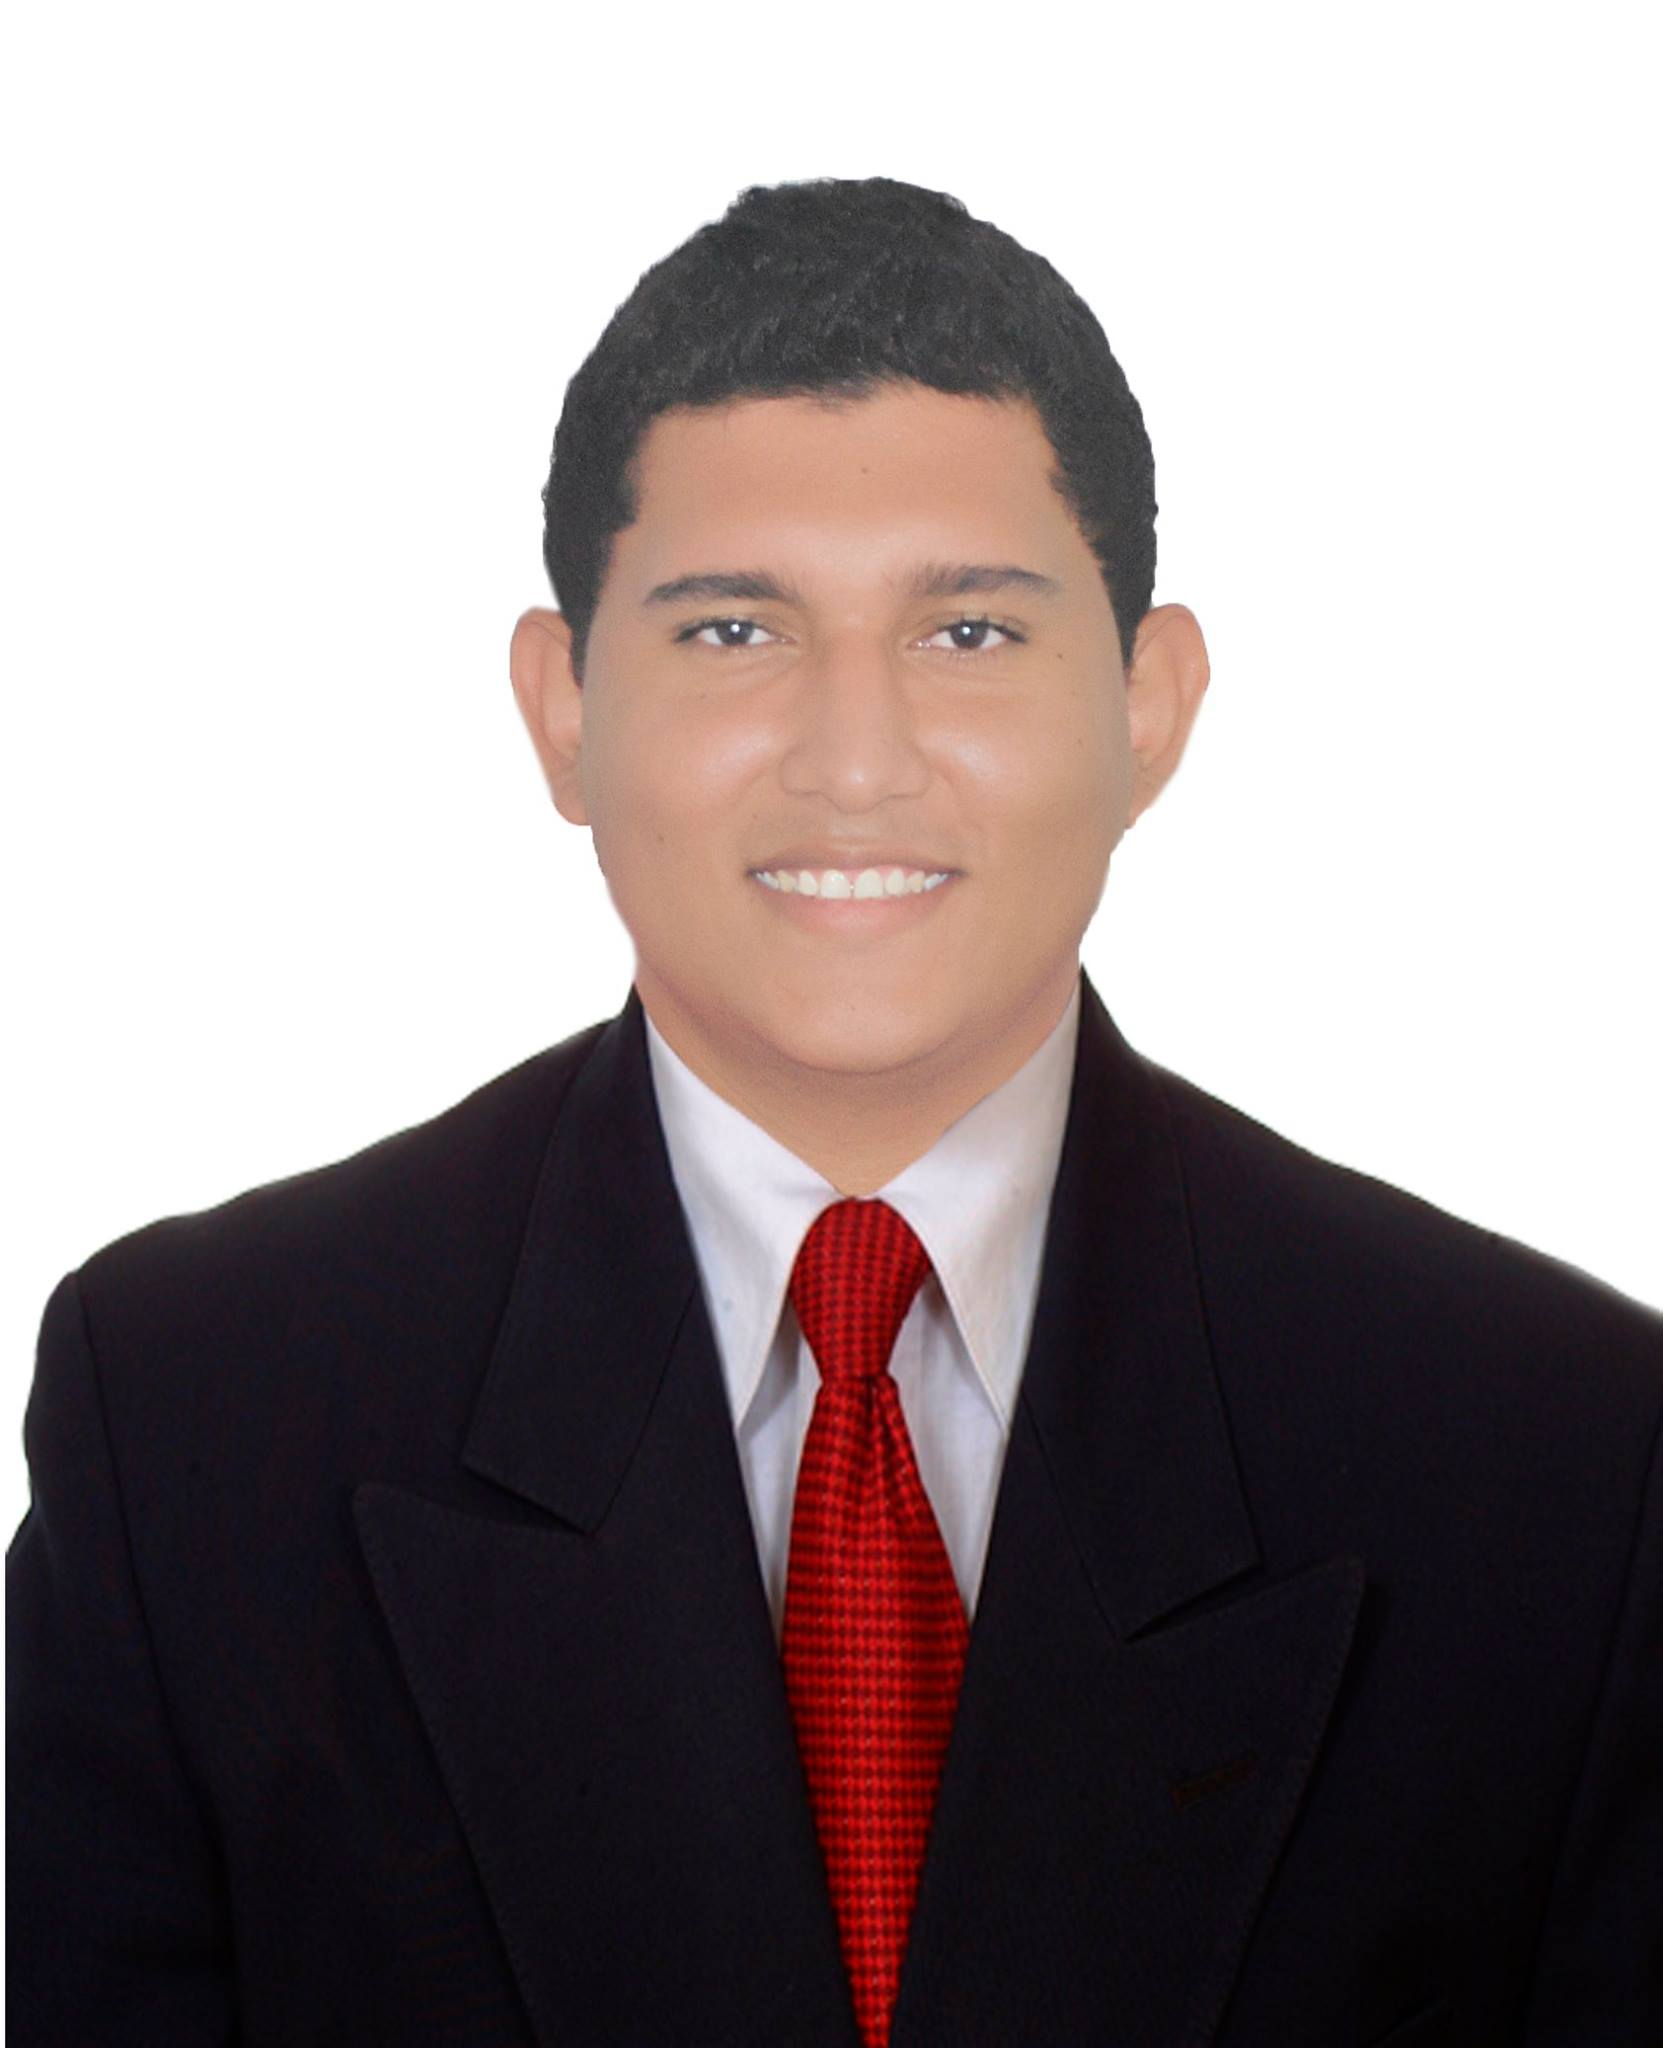 Franco Moreno - Mariaceleste / 'Mpazzuto 'E Bbene